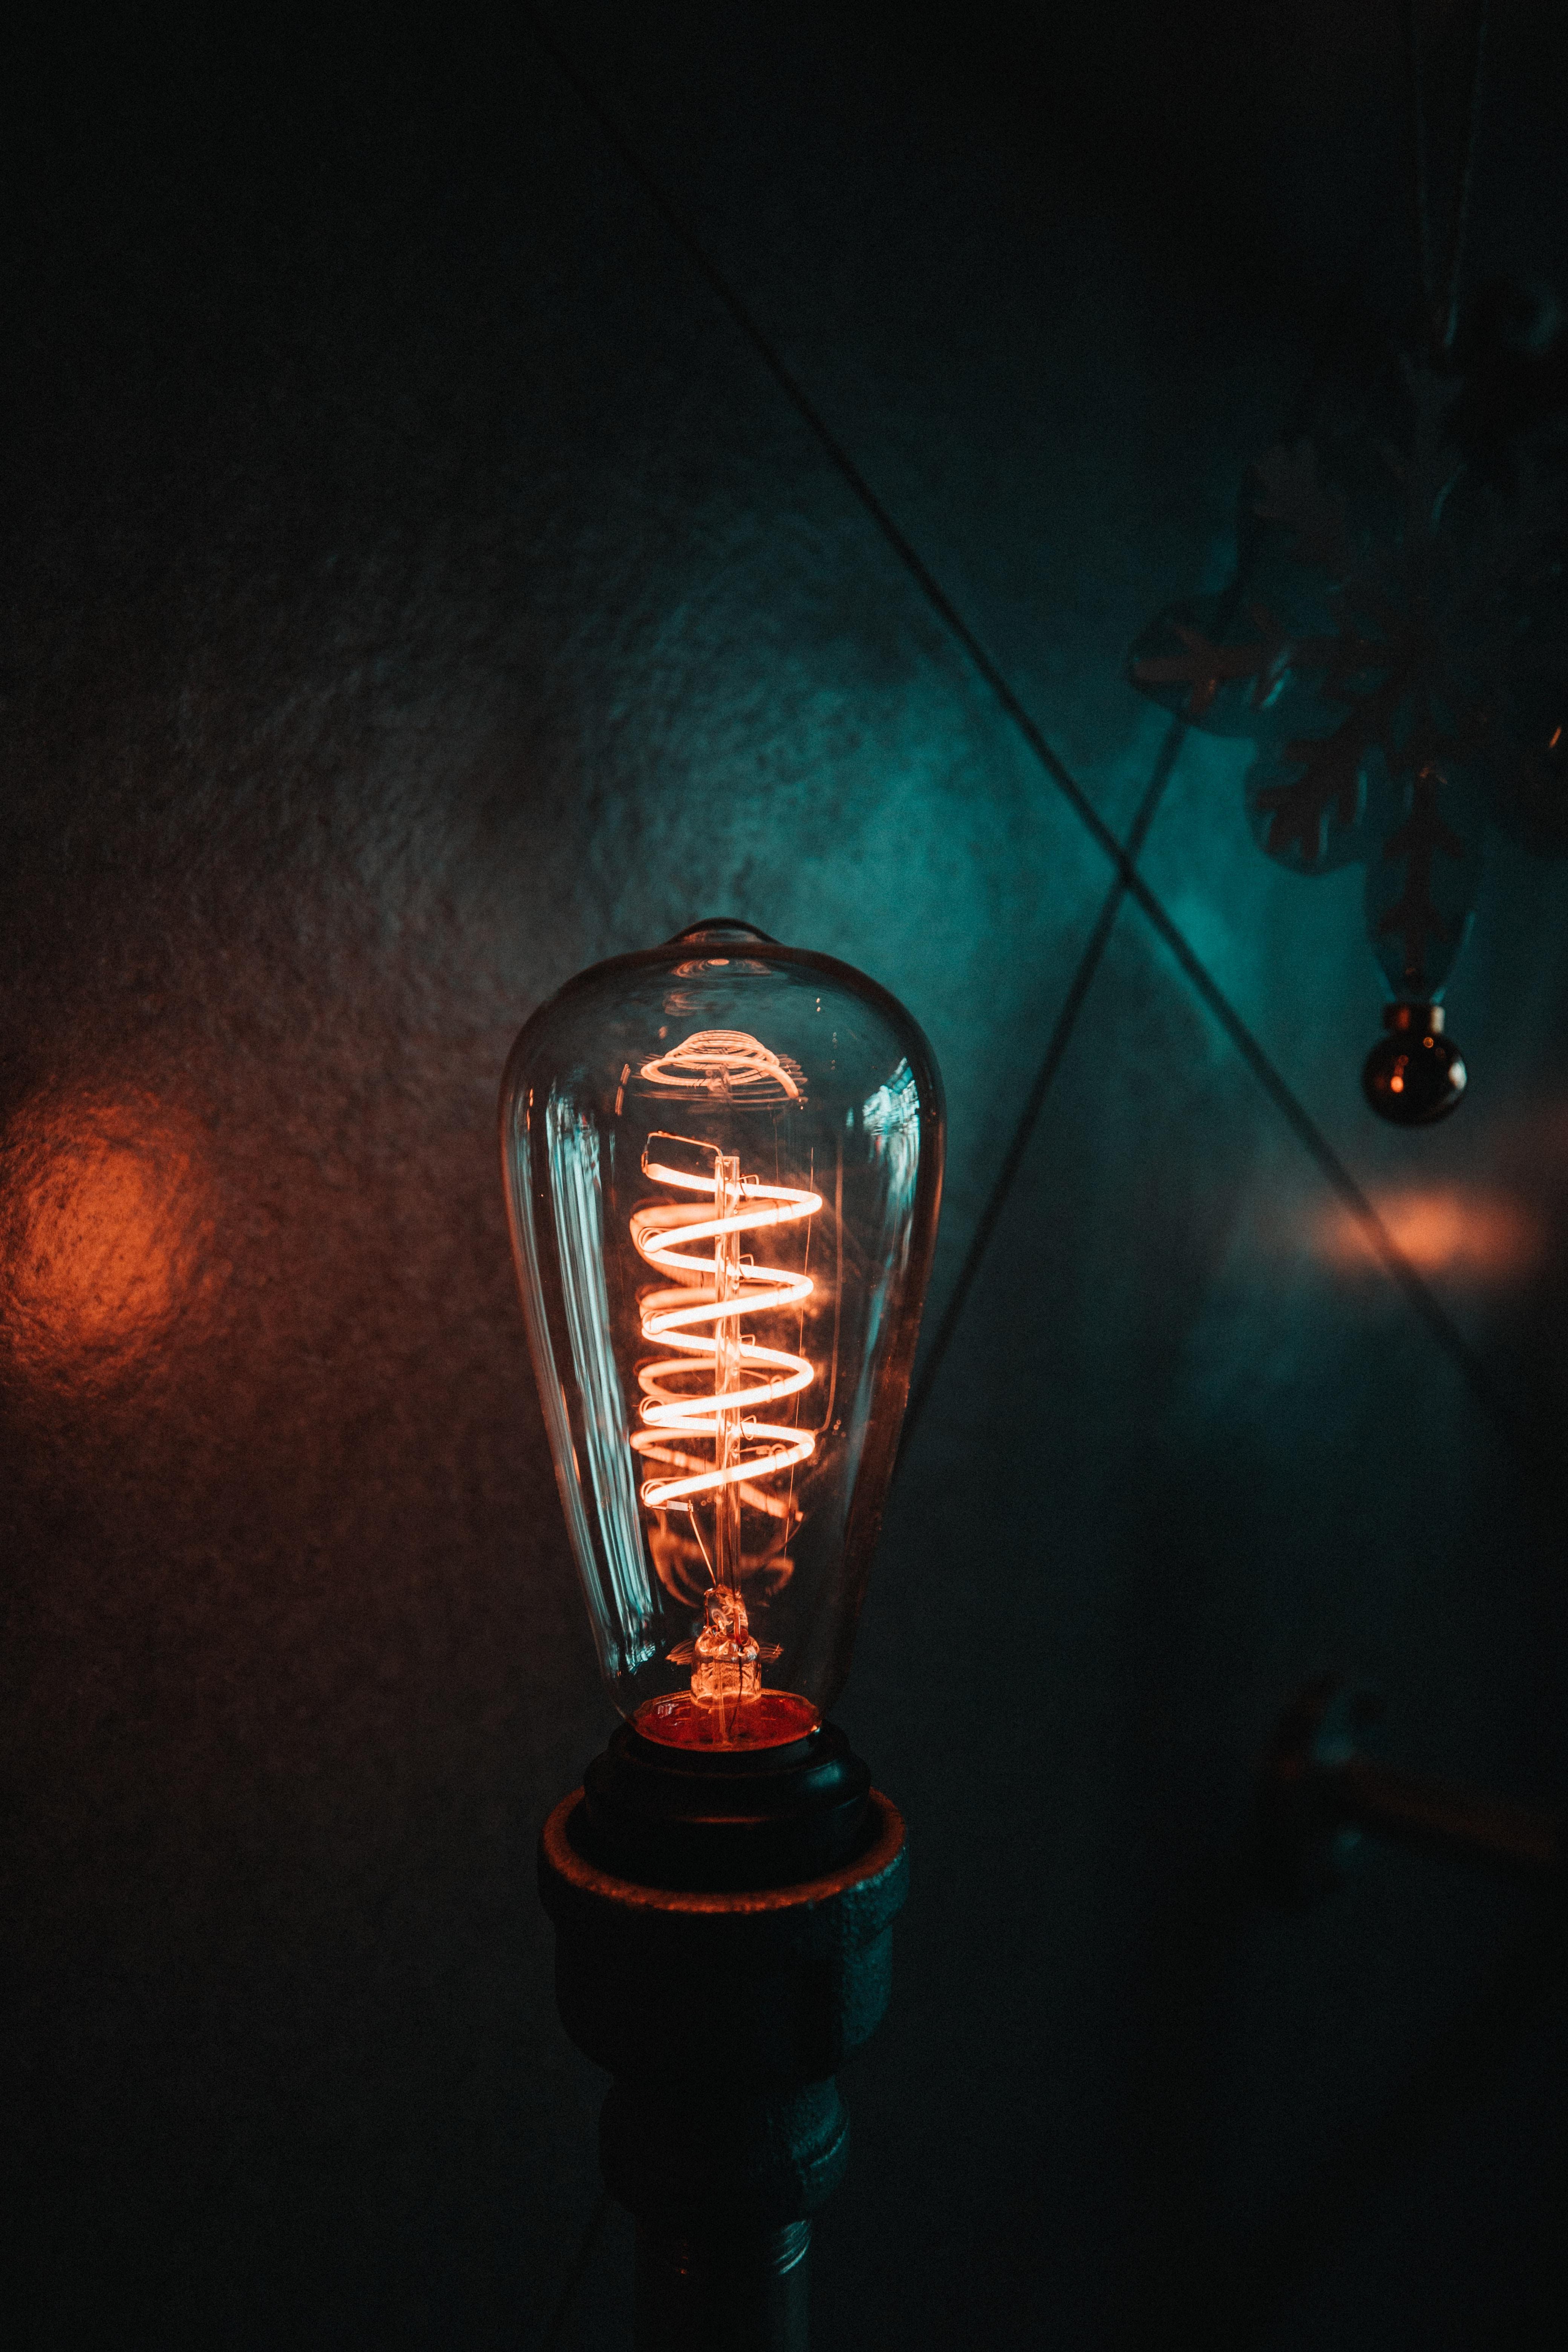 turned-on filament bulb